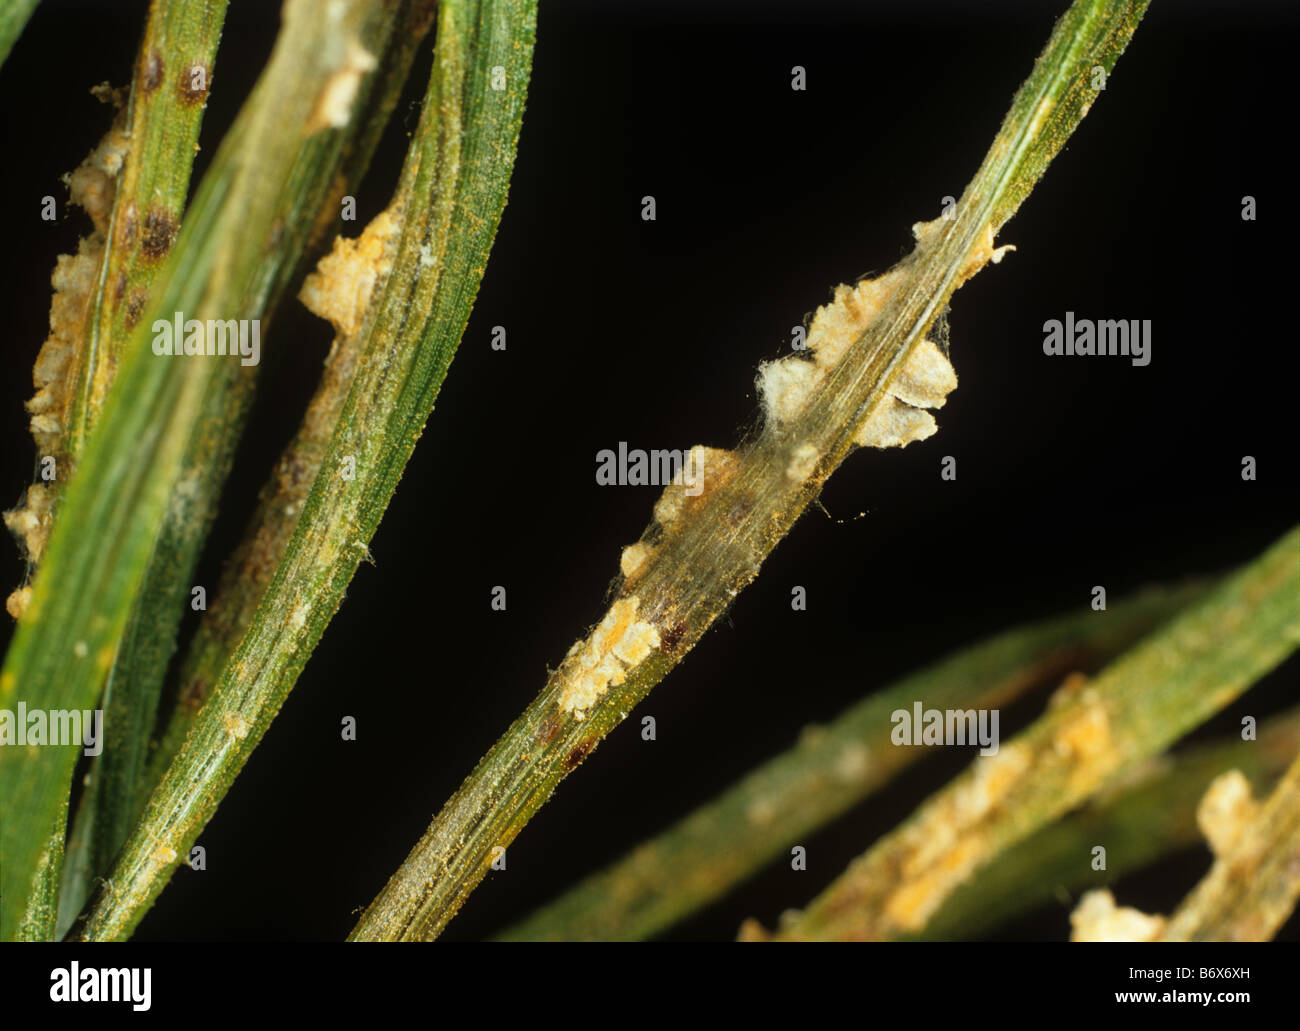 Needle rust Coleosporium tussilaginis pustules on pine needles - Stock Image